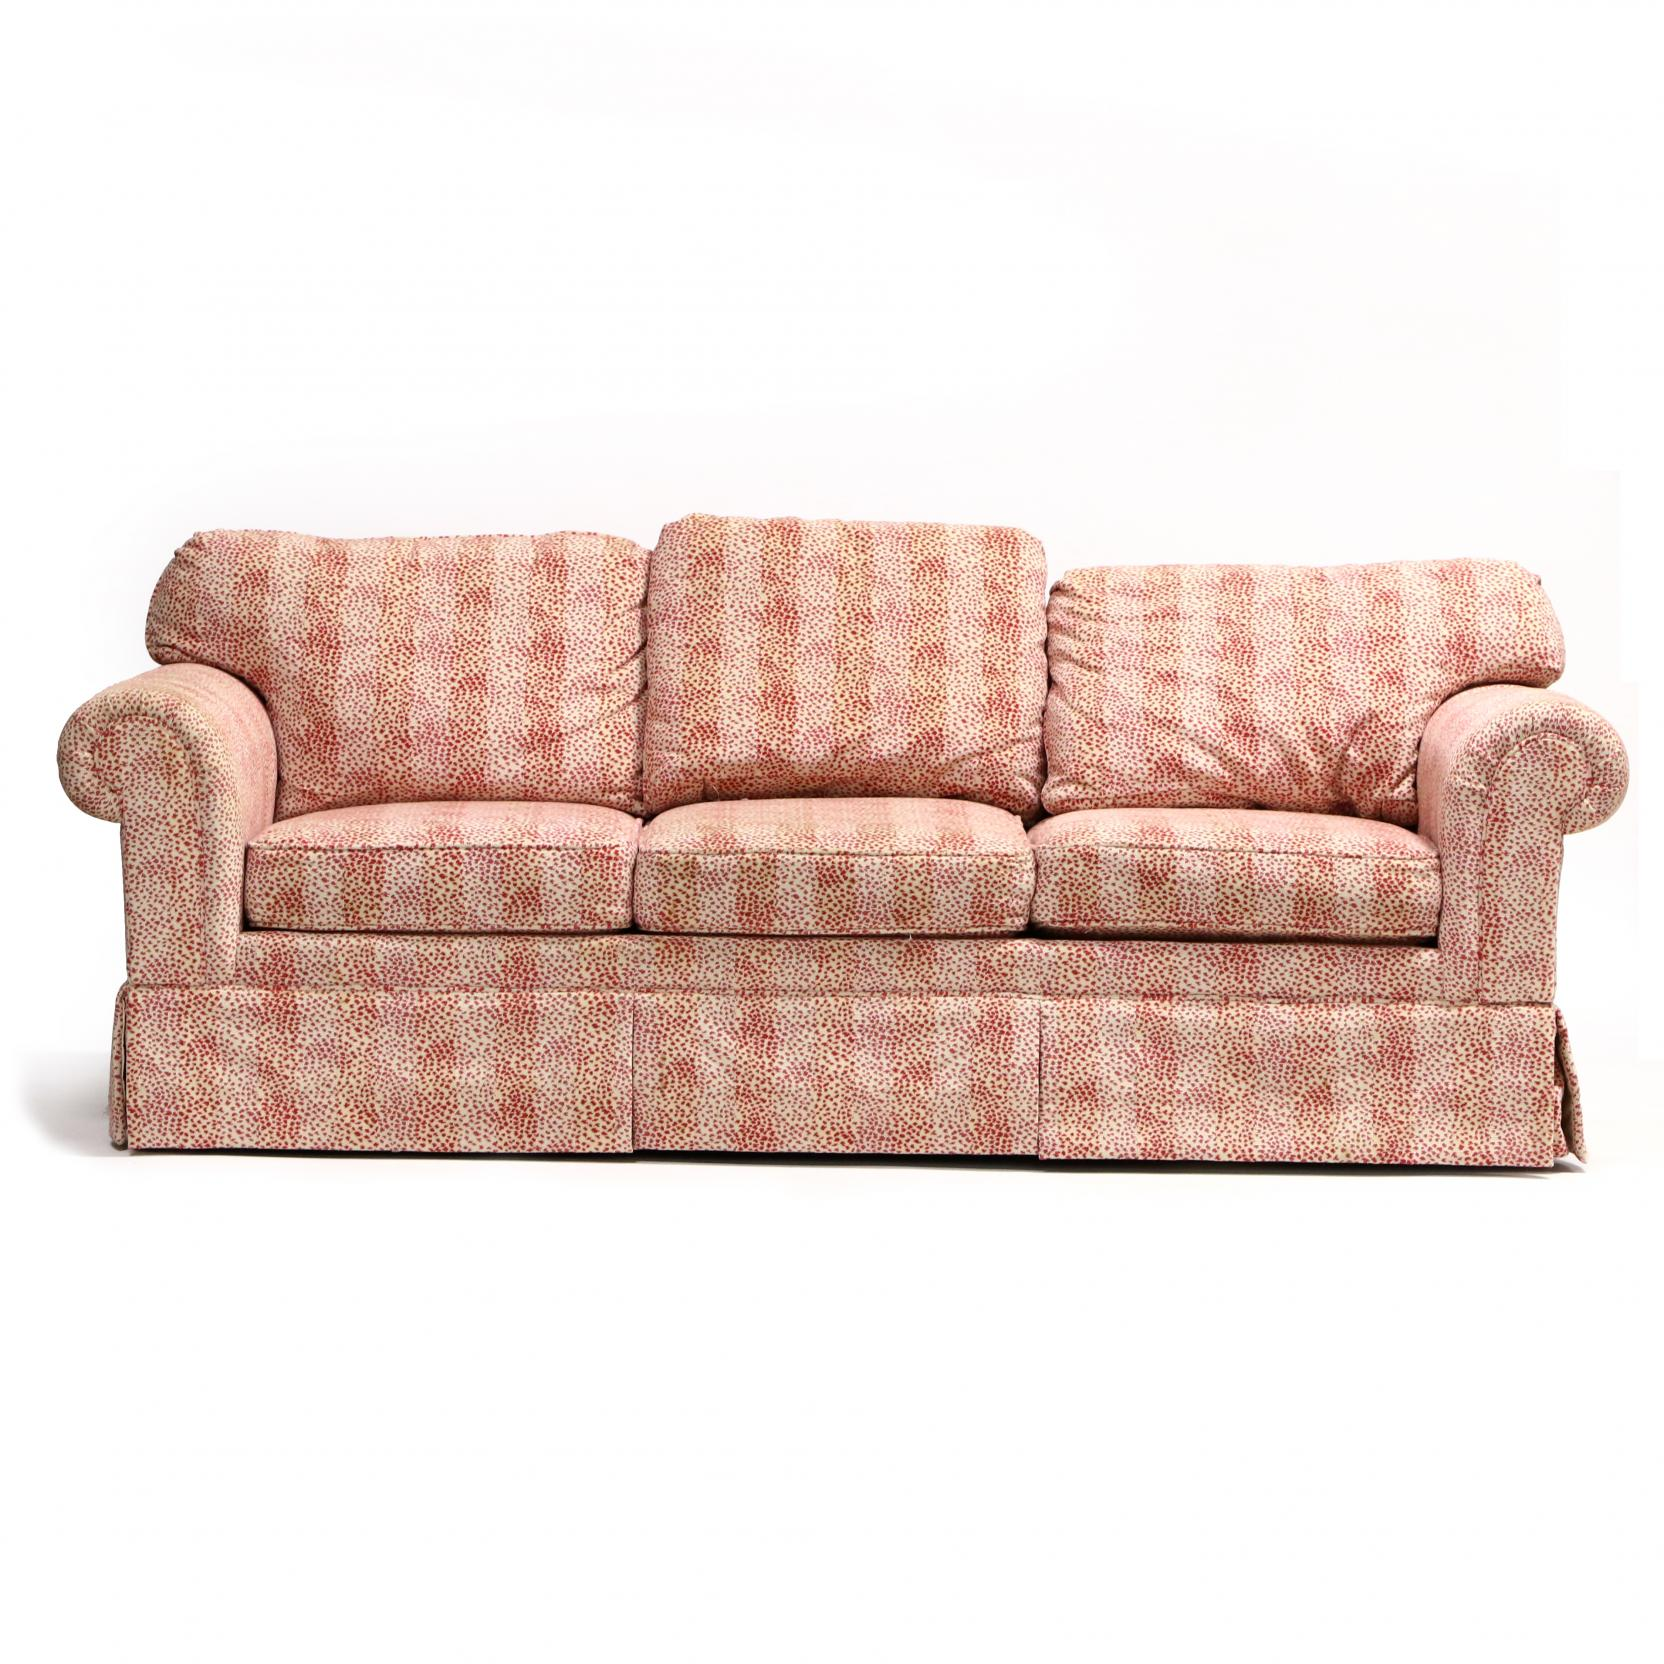 heirloom-red-and-white-animal-print-sofa